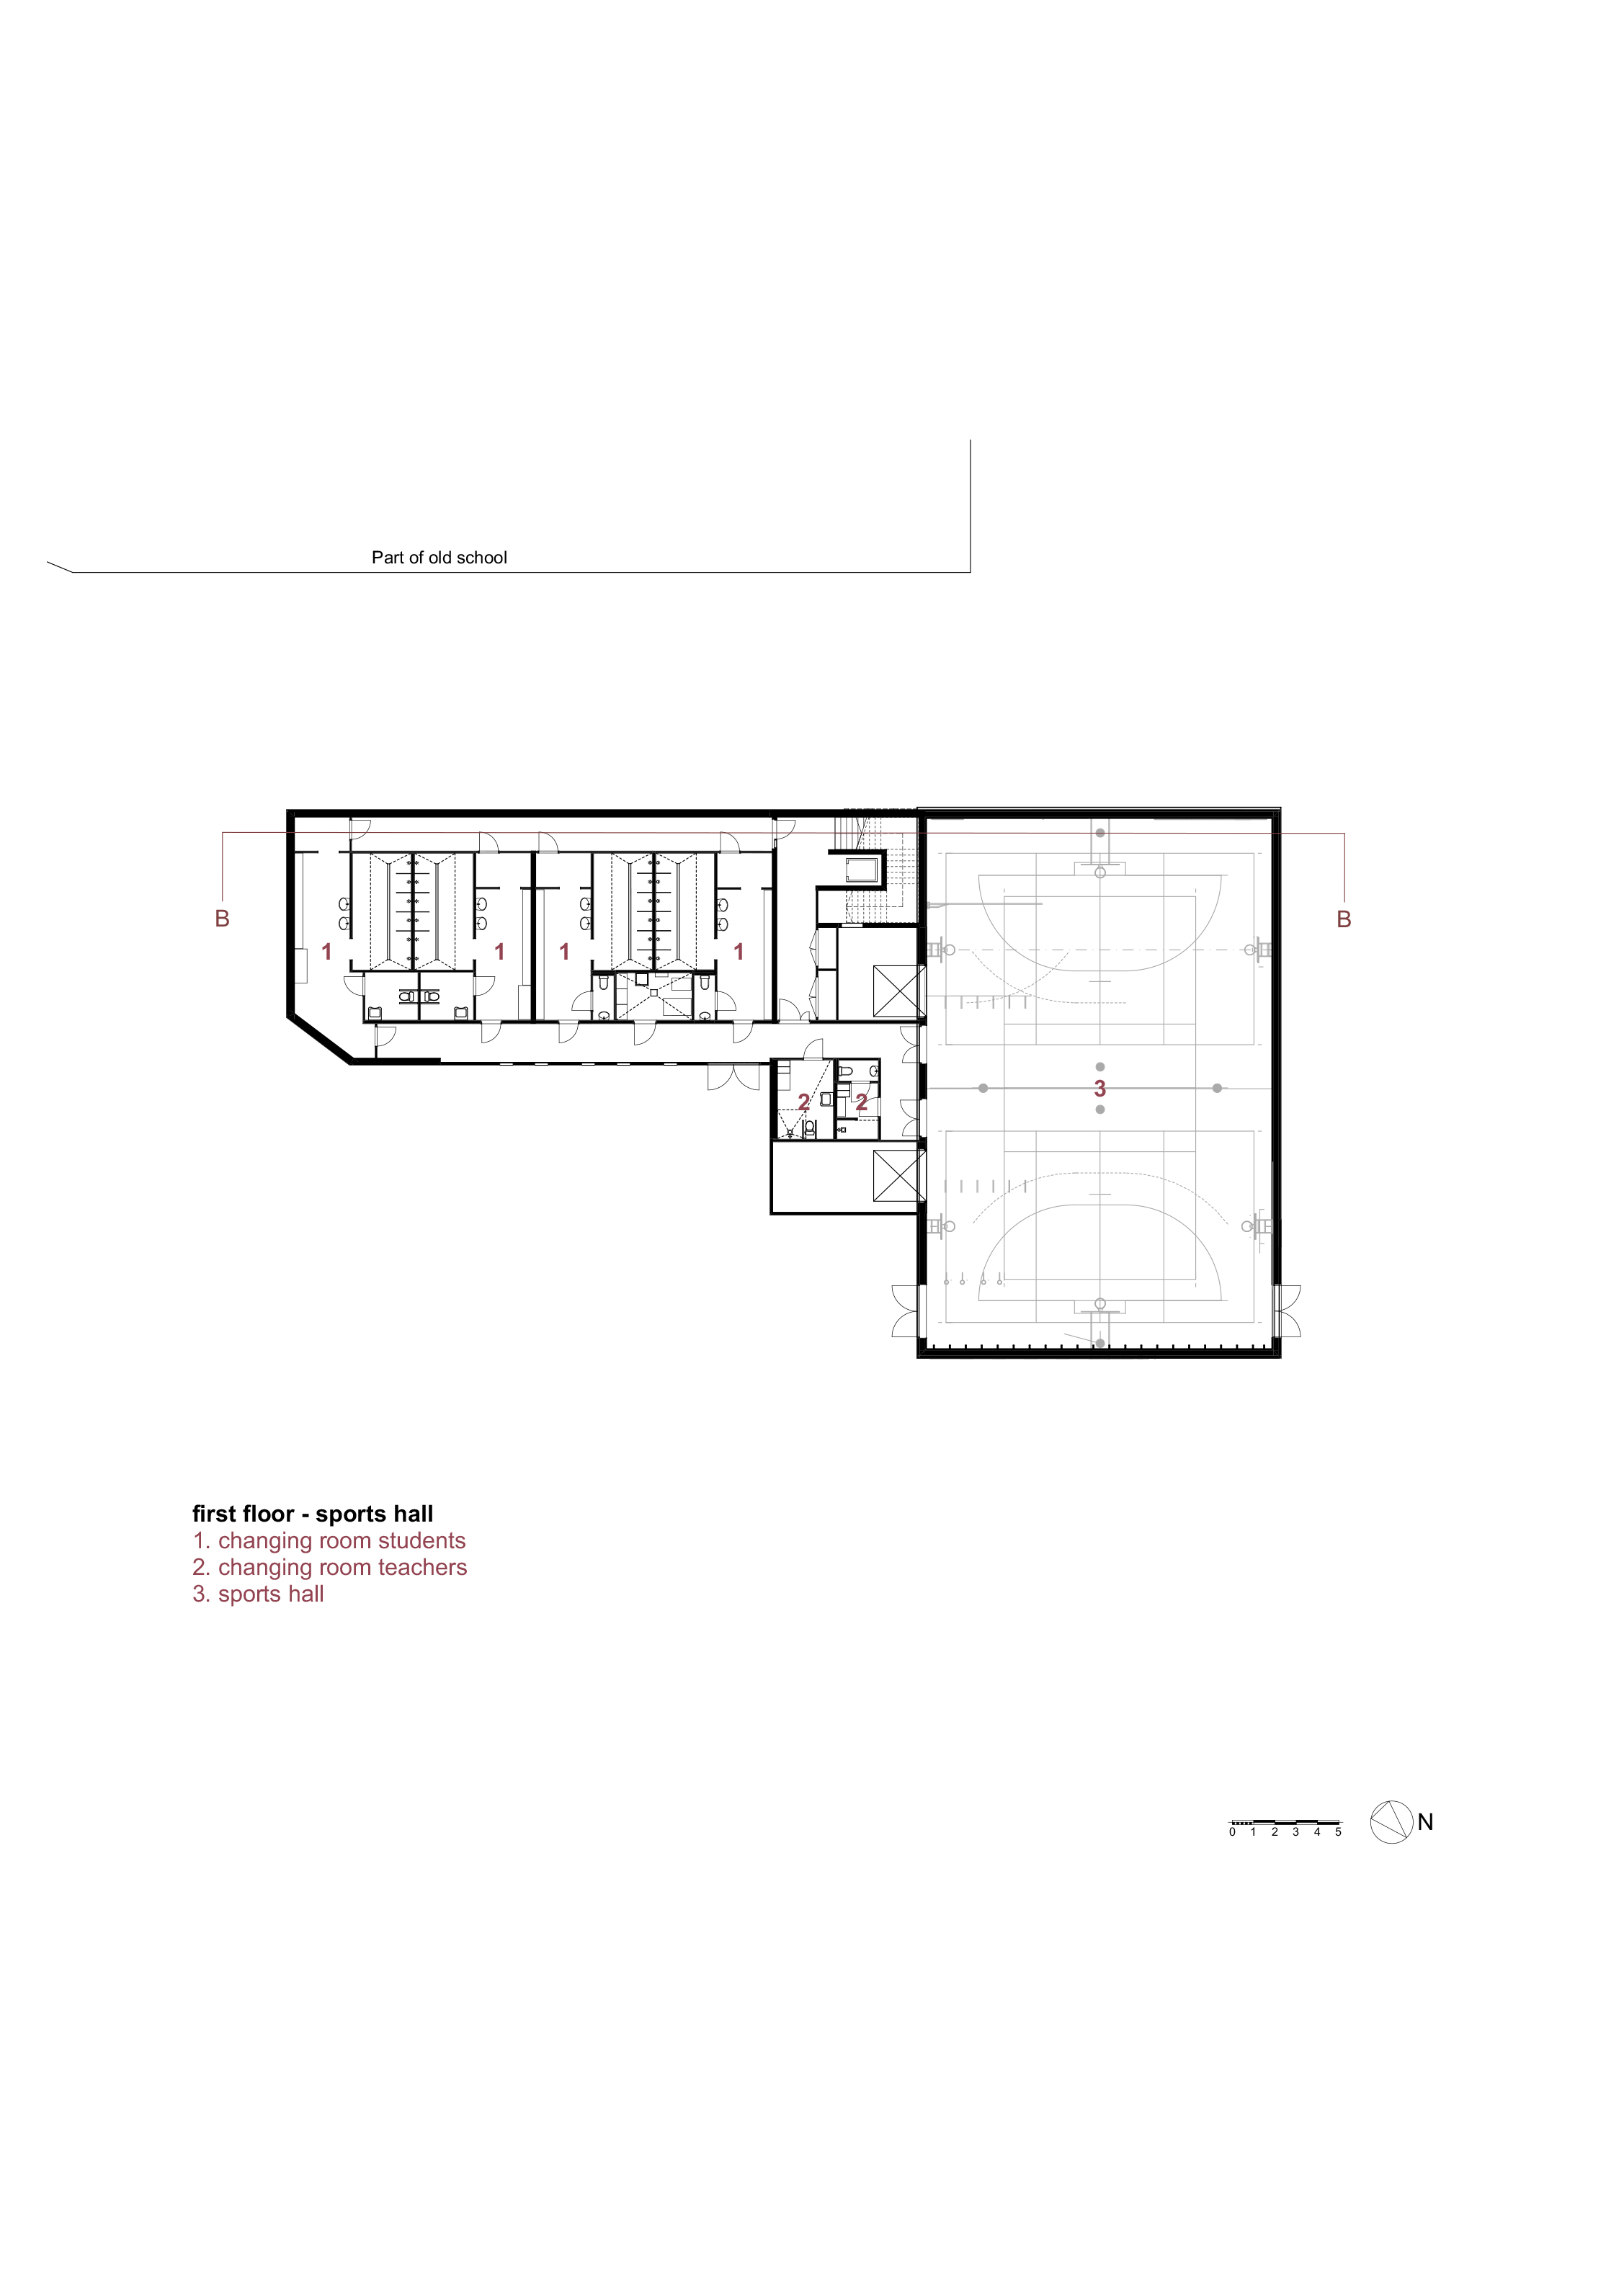 Planforum Arkitekter_ Hebekkskole_Sportshall.jpg